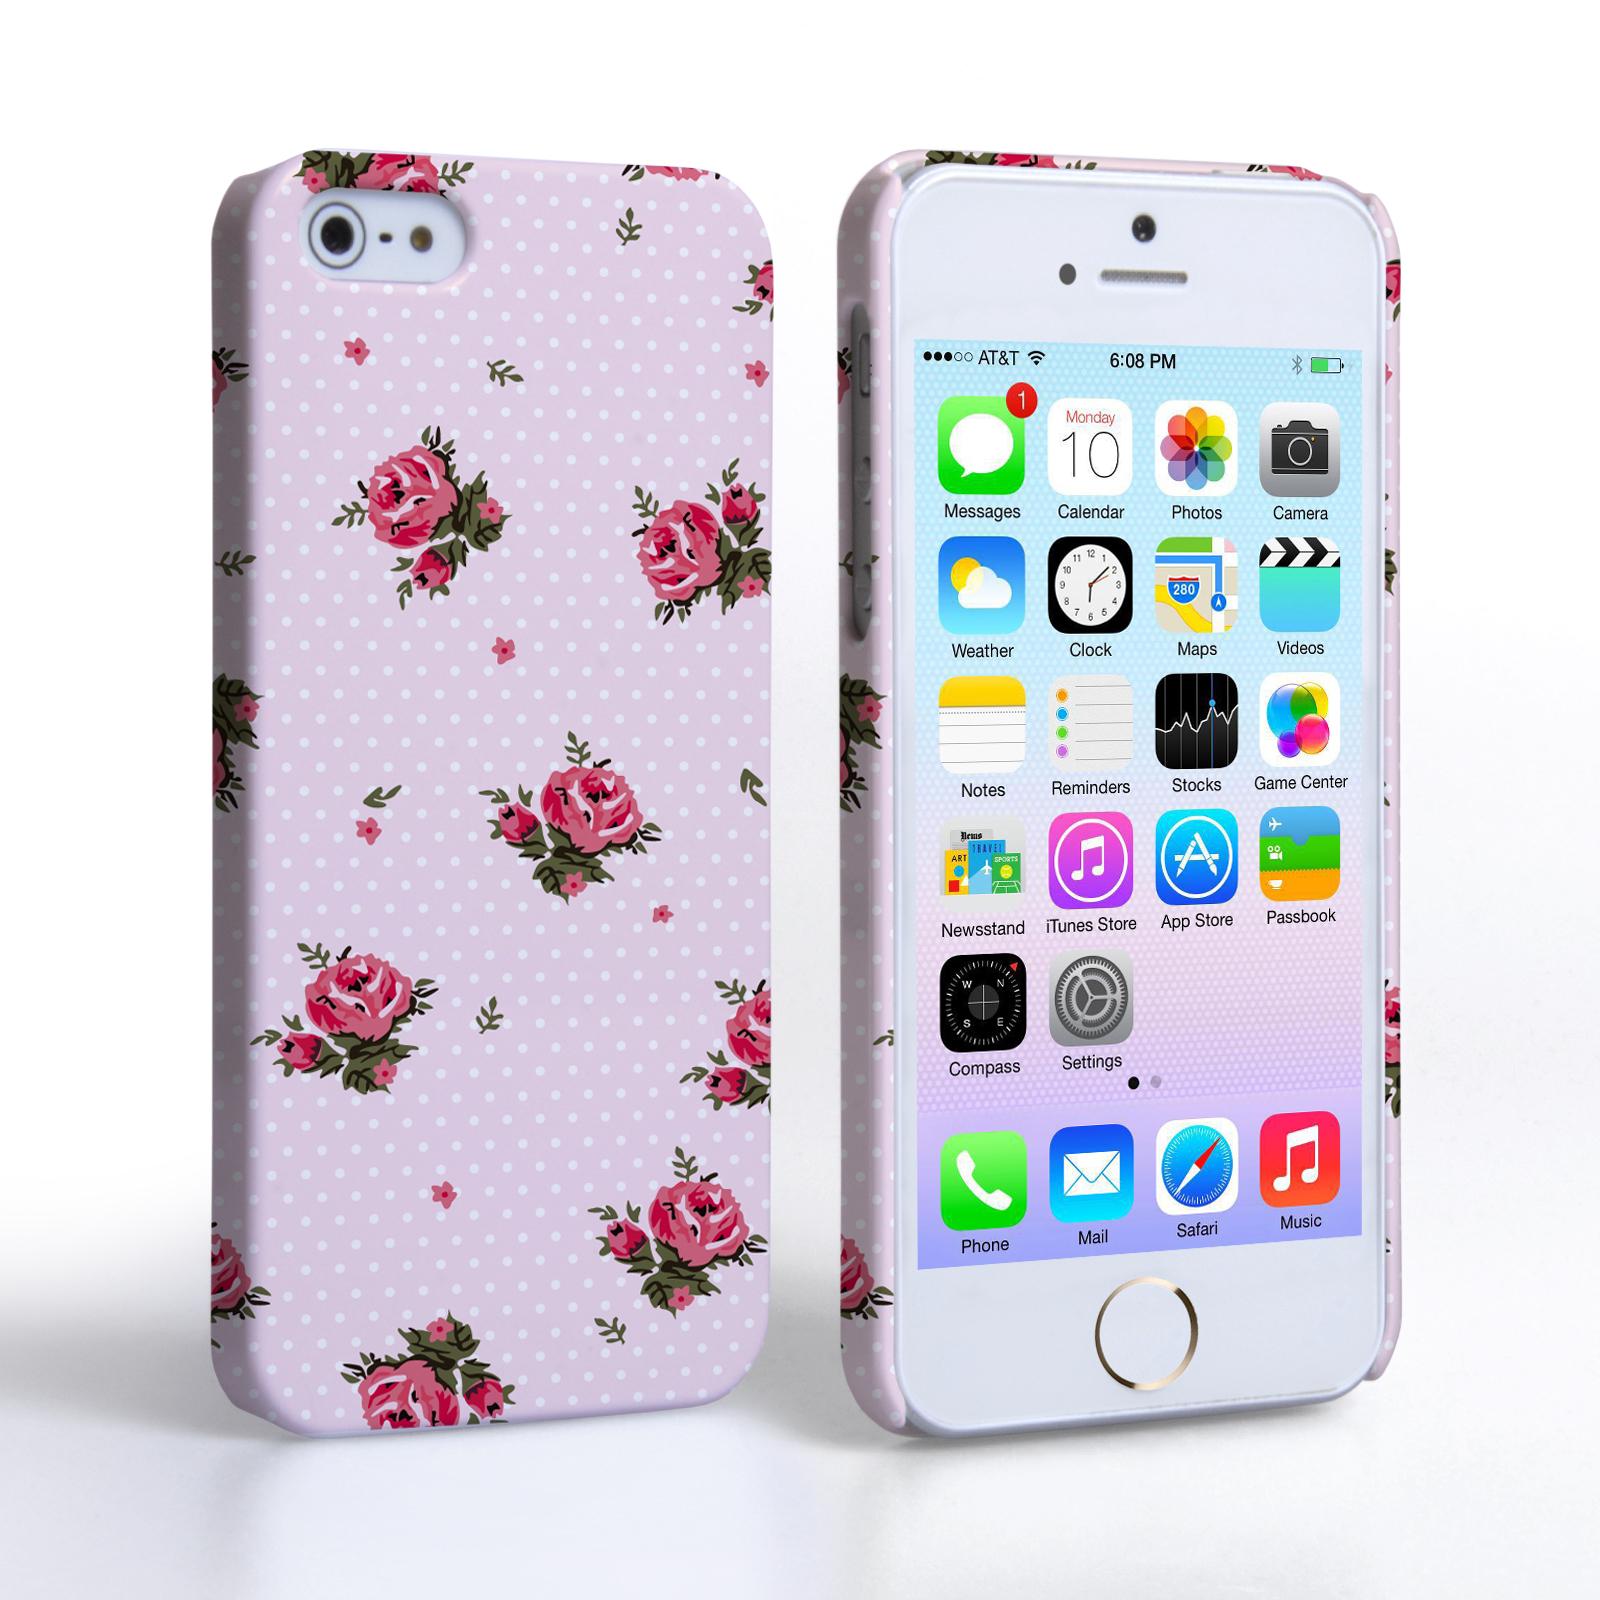 Home Phone Cases Apple iPhone 5 5S Cases Caseflex iPhone 5 1600x1600